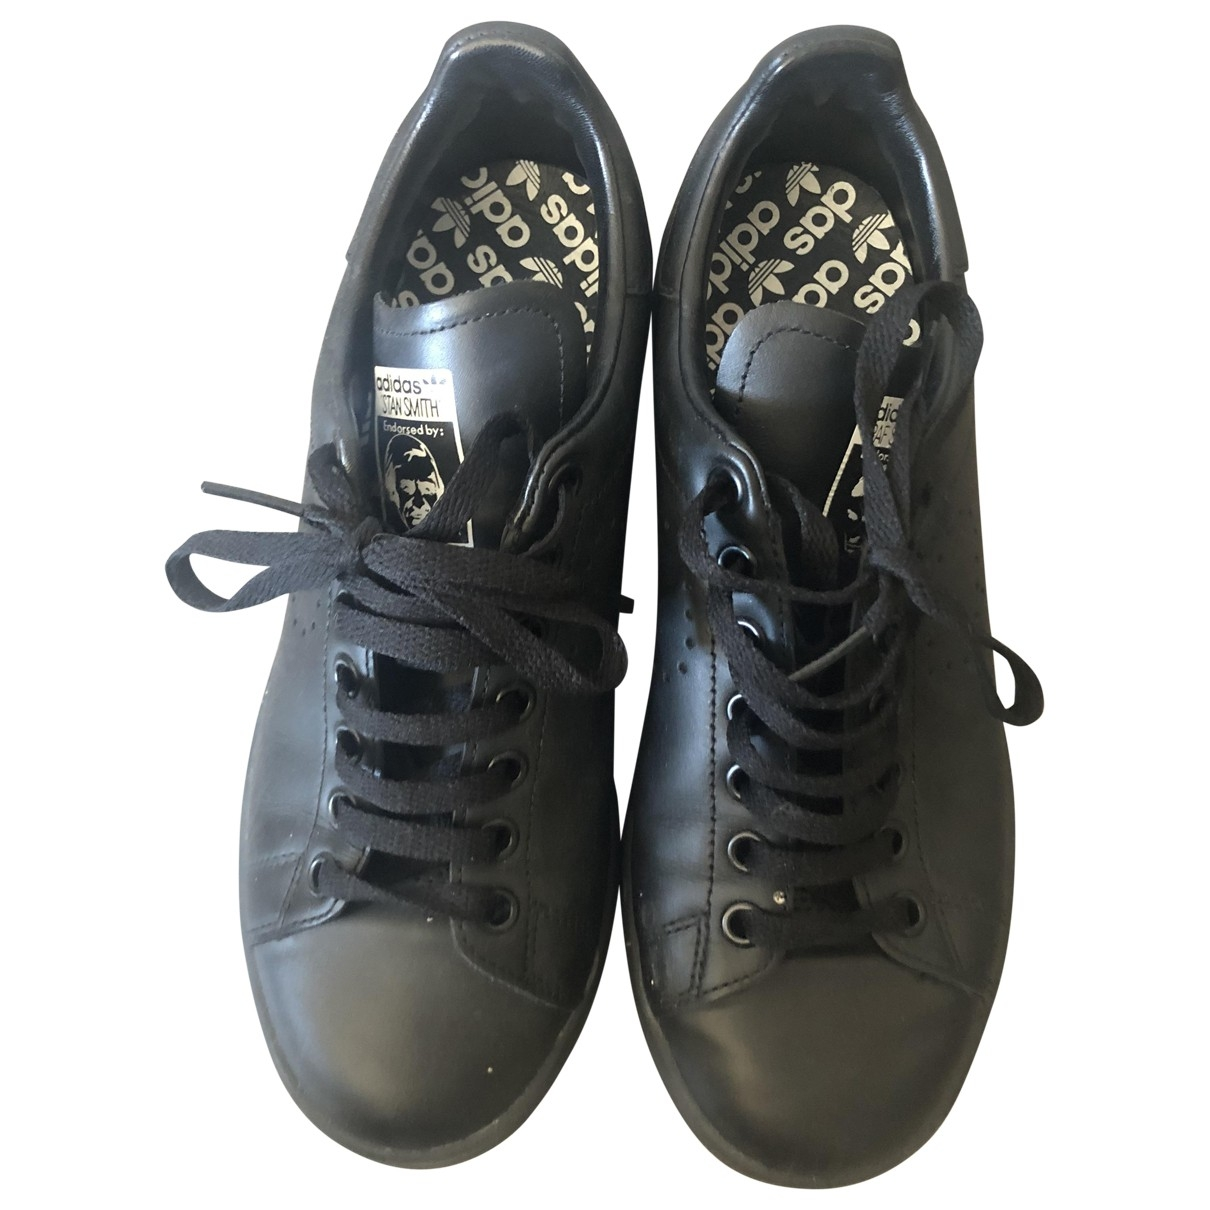 Adidas X Raf Simons Stan Smith Black Leather Trainers for Women 38.5 EU